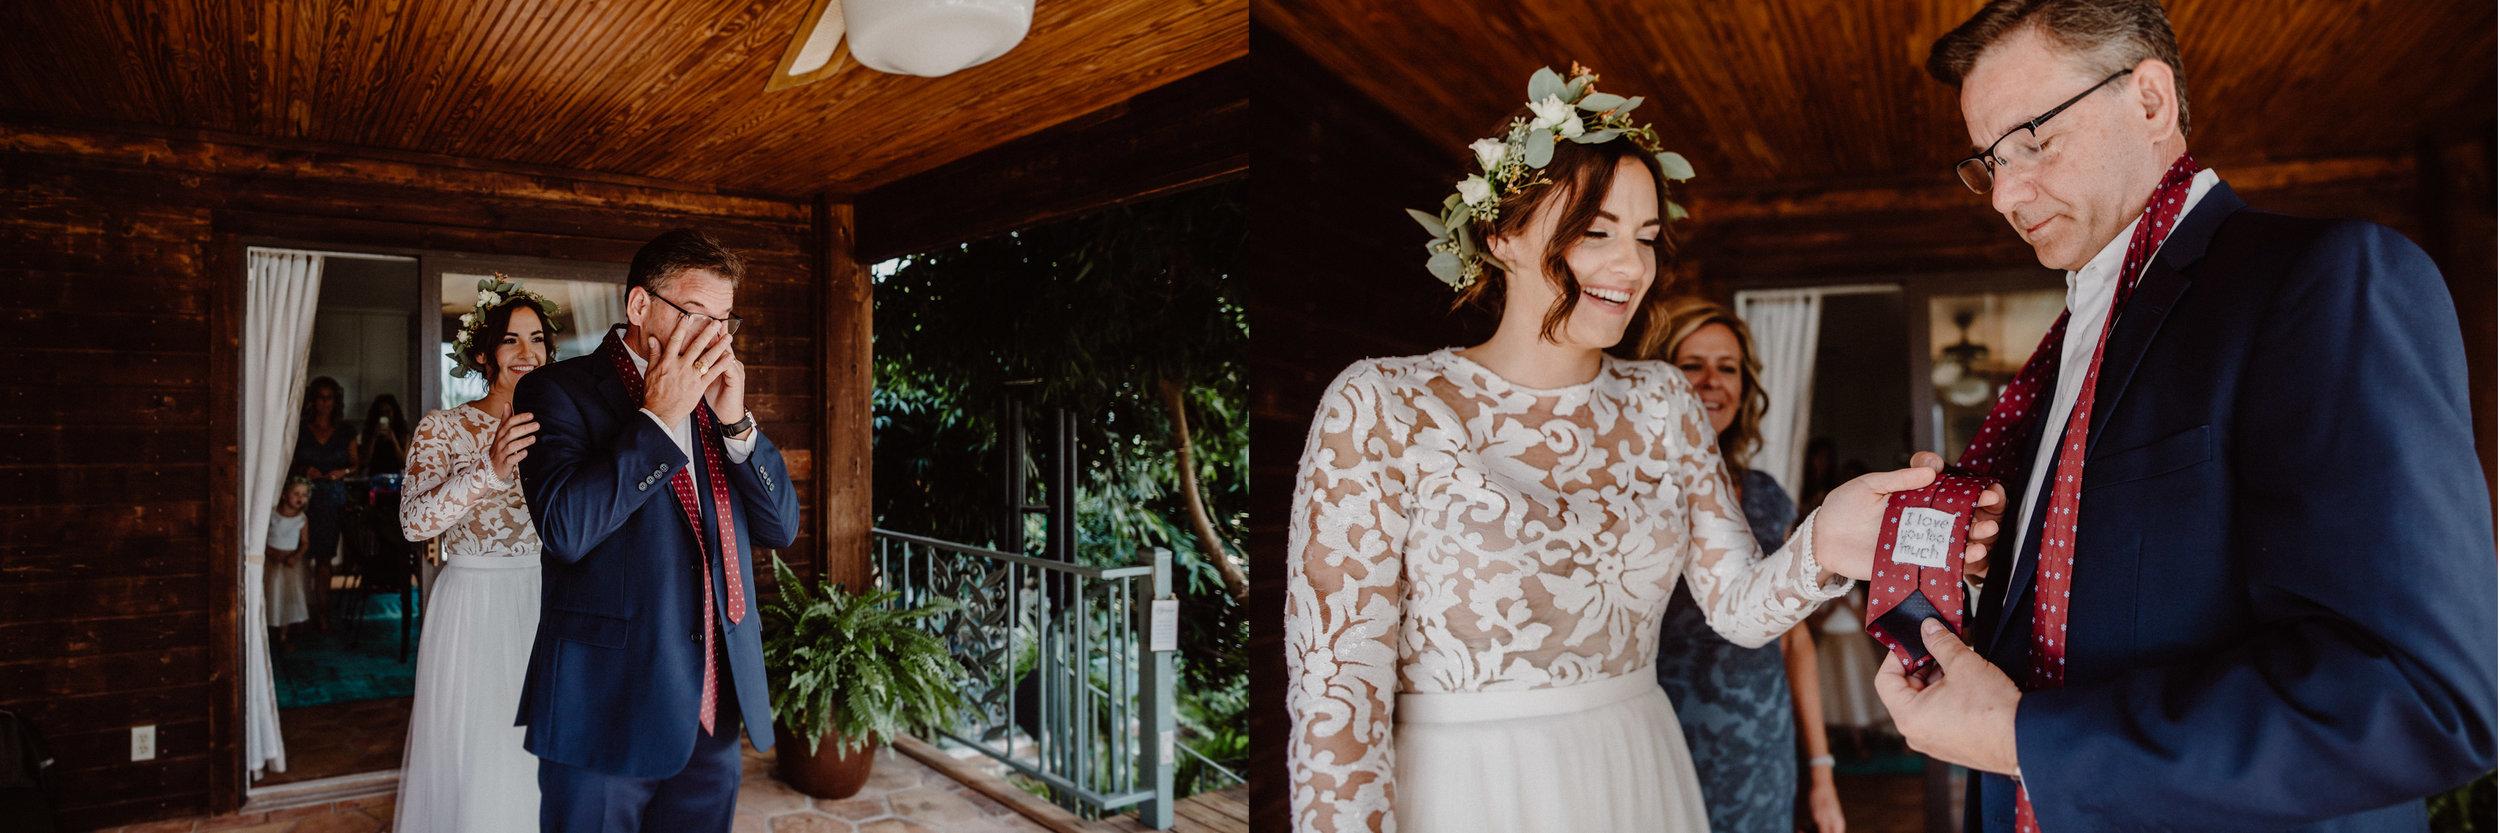 greenhouse-driftwood-wedding-2.jpg